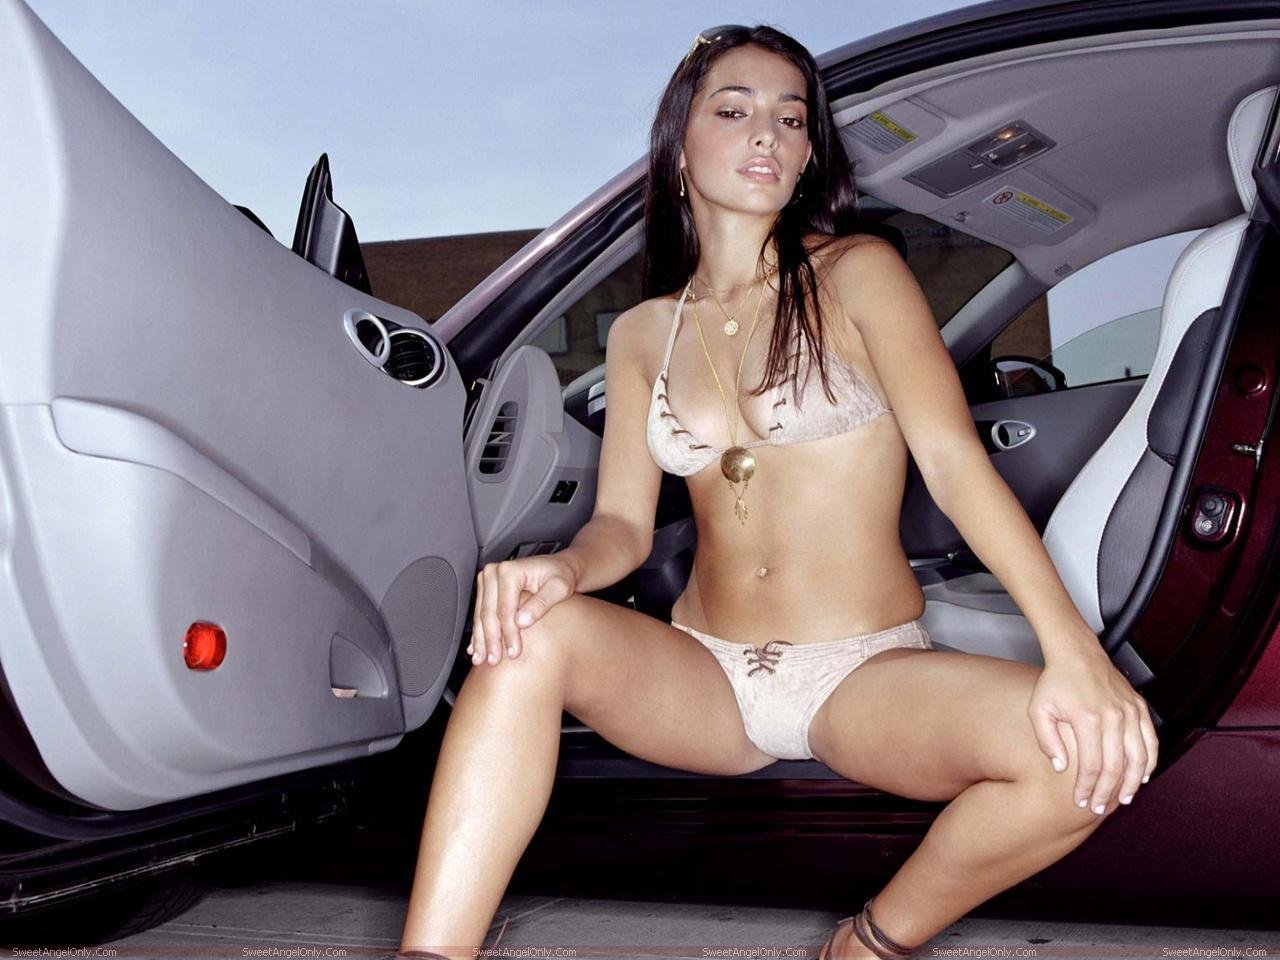 http://2.bp.blogspot.com/-p1SbkKHJbV8/TaMetB48mNI/AAAAAAAAGXk/ENr-zvg78gU/s1600/natalie_martinez_lingerie_wallpaper_in_car_sweetangelonly.jpg